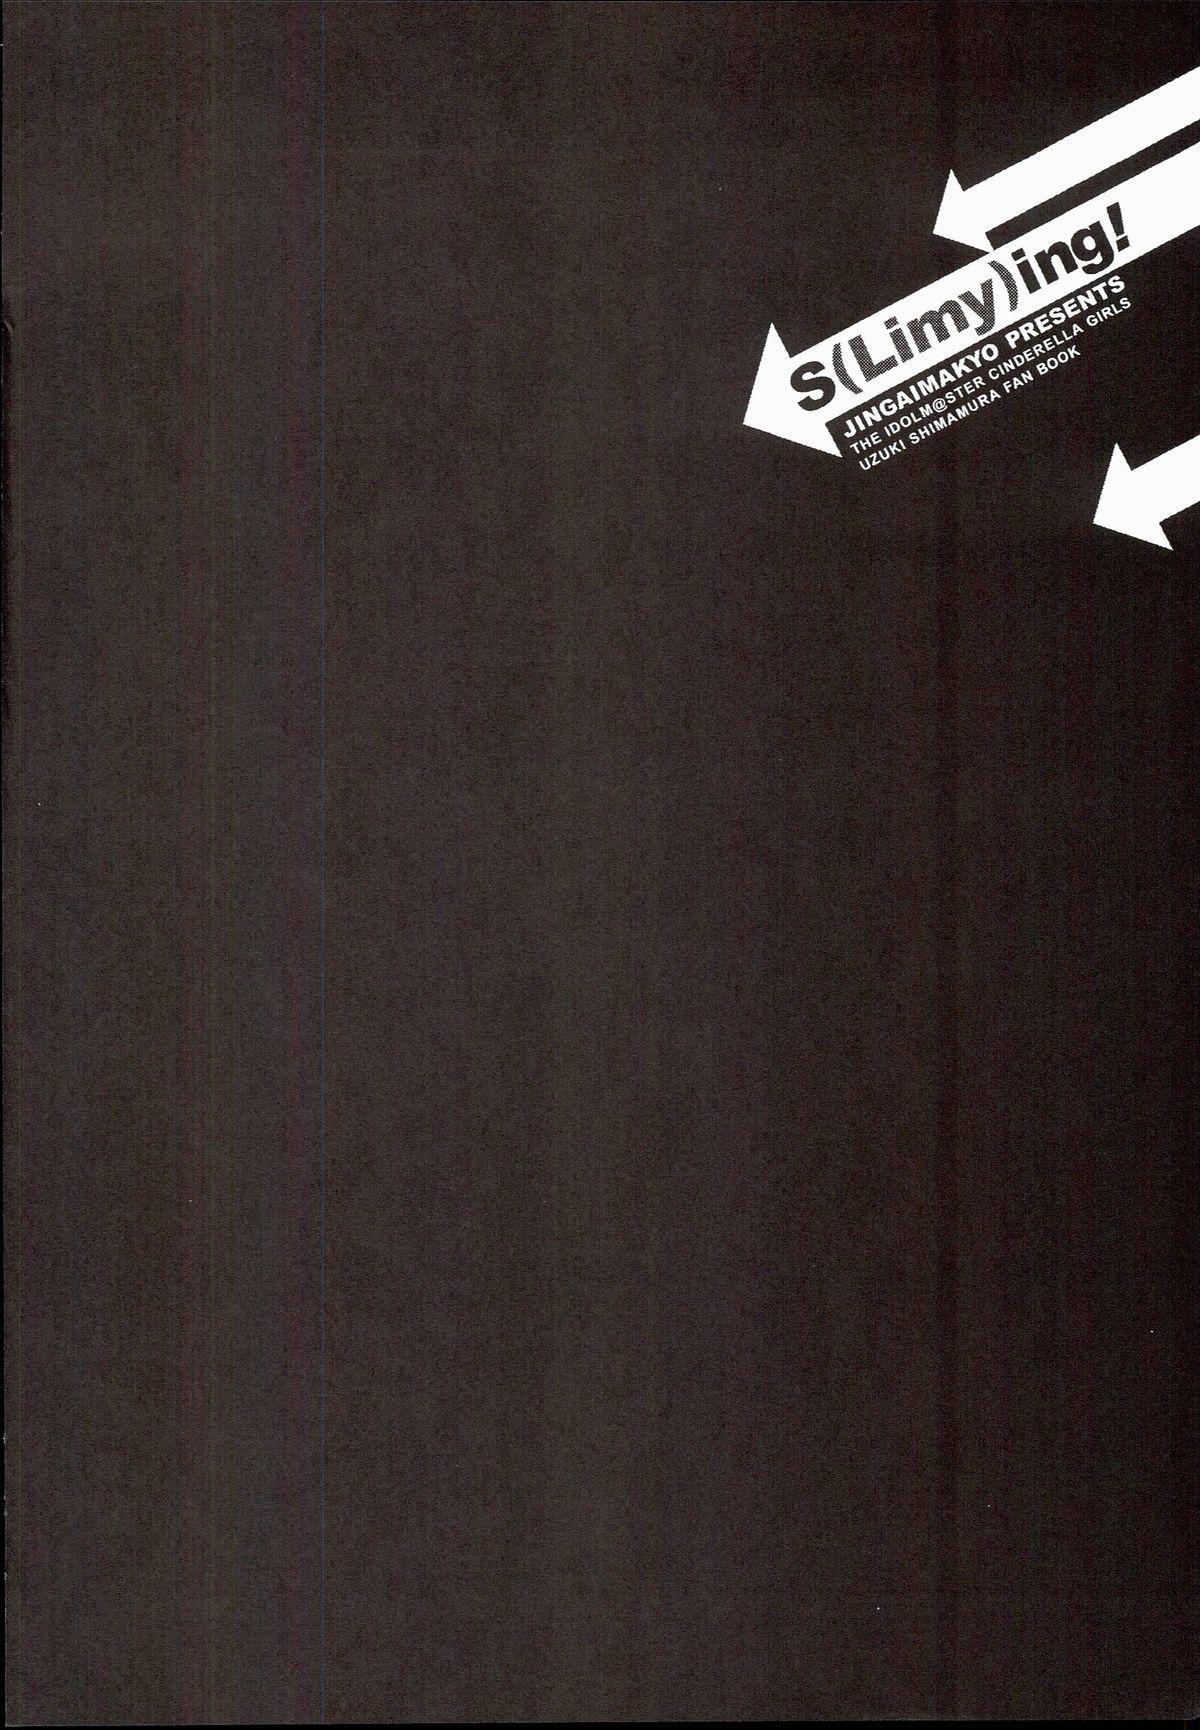 (C89) [Jingai Makyou (Inue Shinsuke)] S(Limy)ing! (THE iDOLM@STER CINDERELLA GIRLS) 3